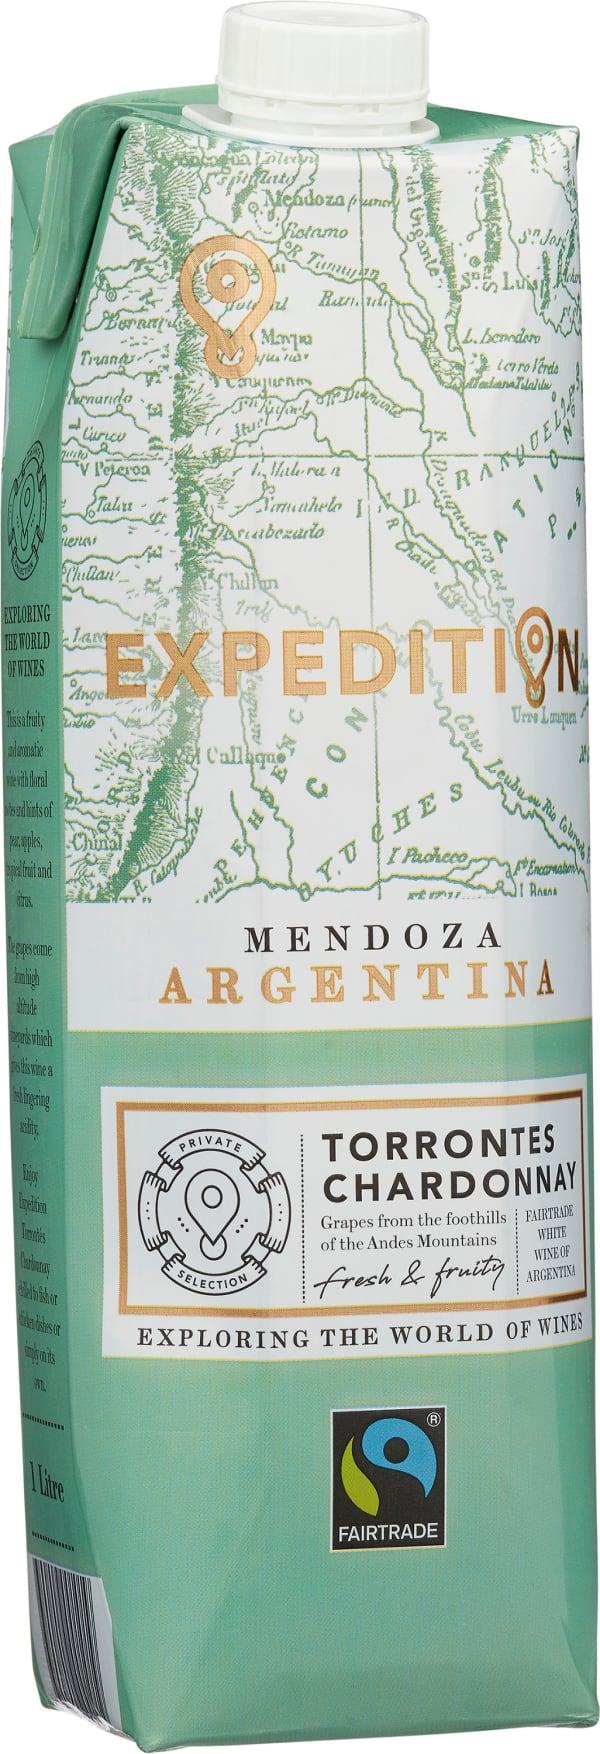 Expedition by Finca Las Moras Torrontés Chardonnay 2018 carton package